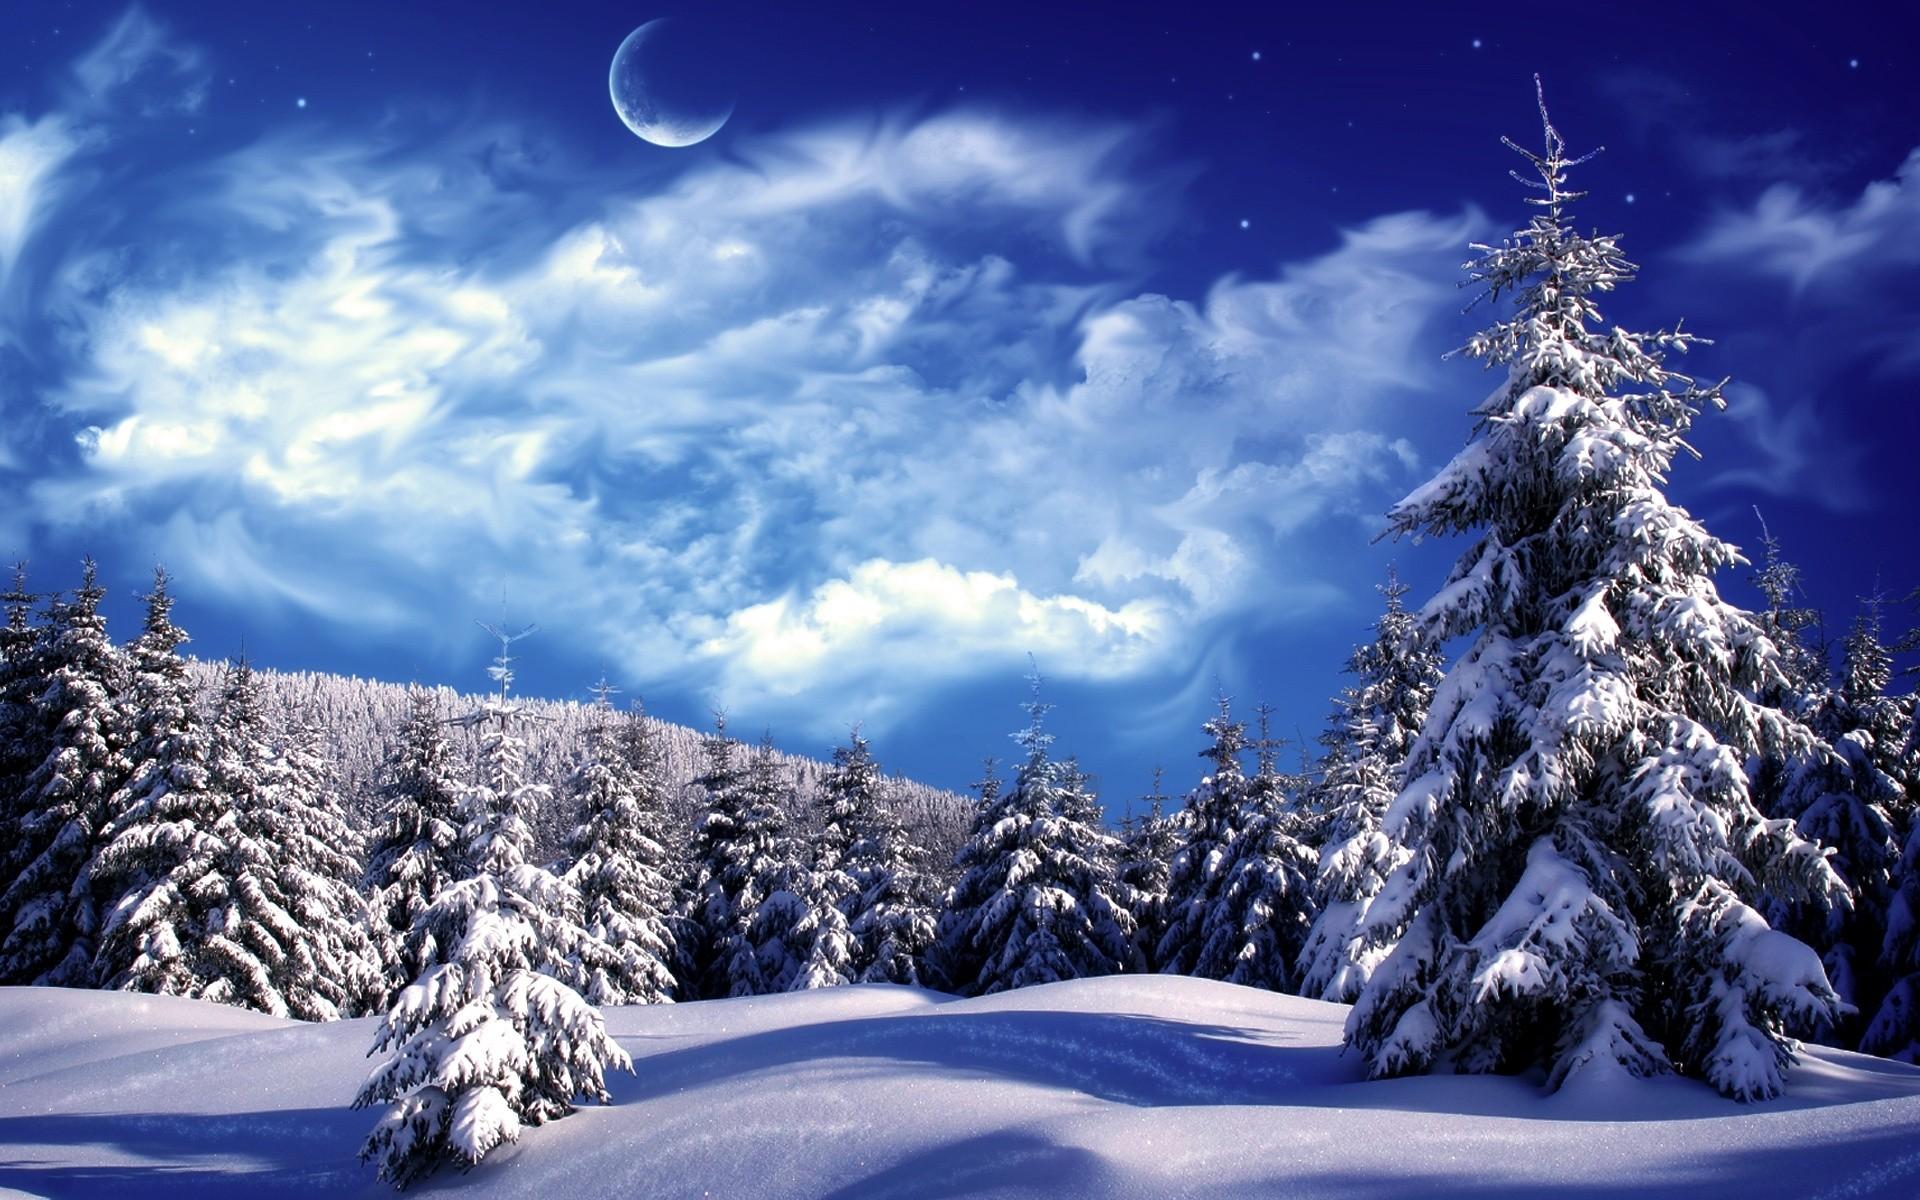 Winter Background Scenes Wallpapertag